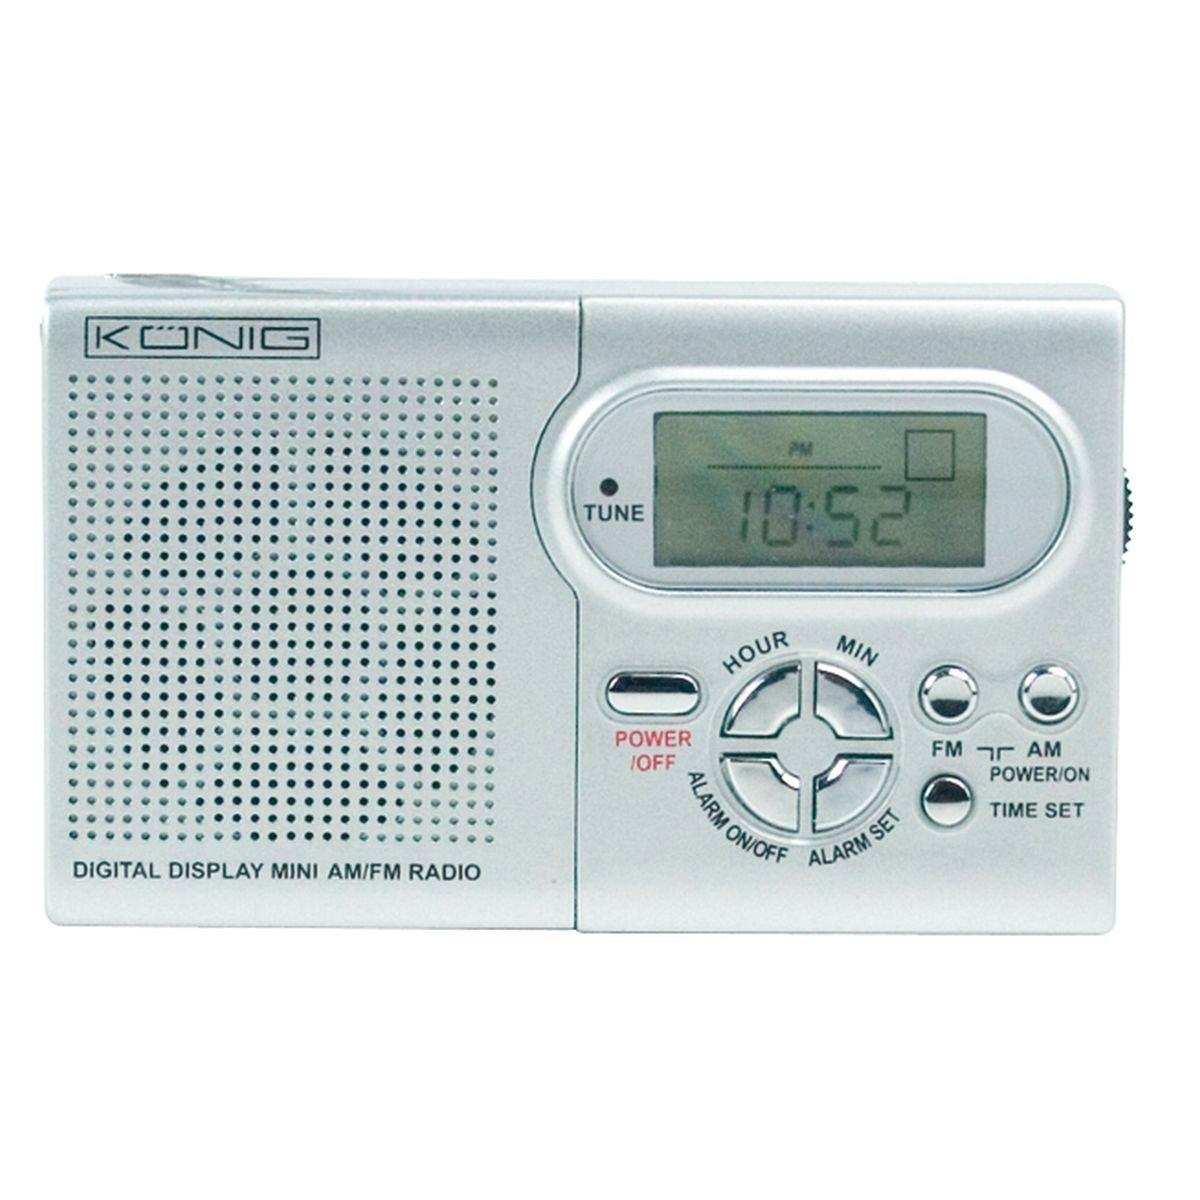 Konig 92x55x20mm AM FM Mini-Portable Radio with Digital Display ...